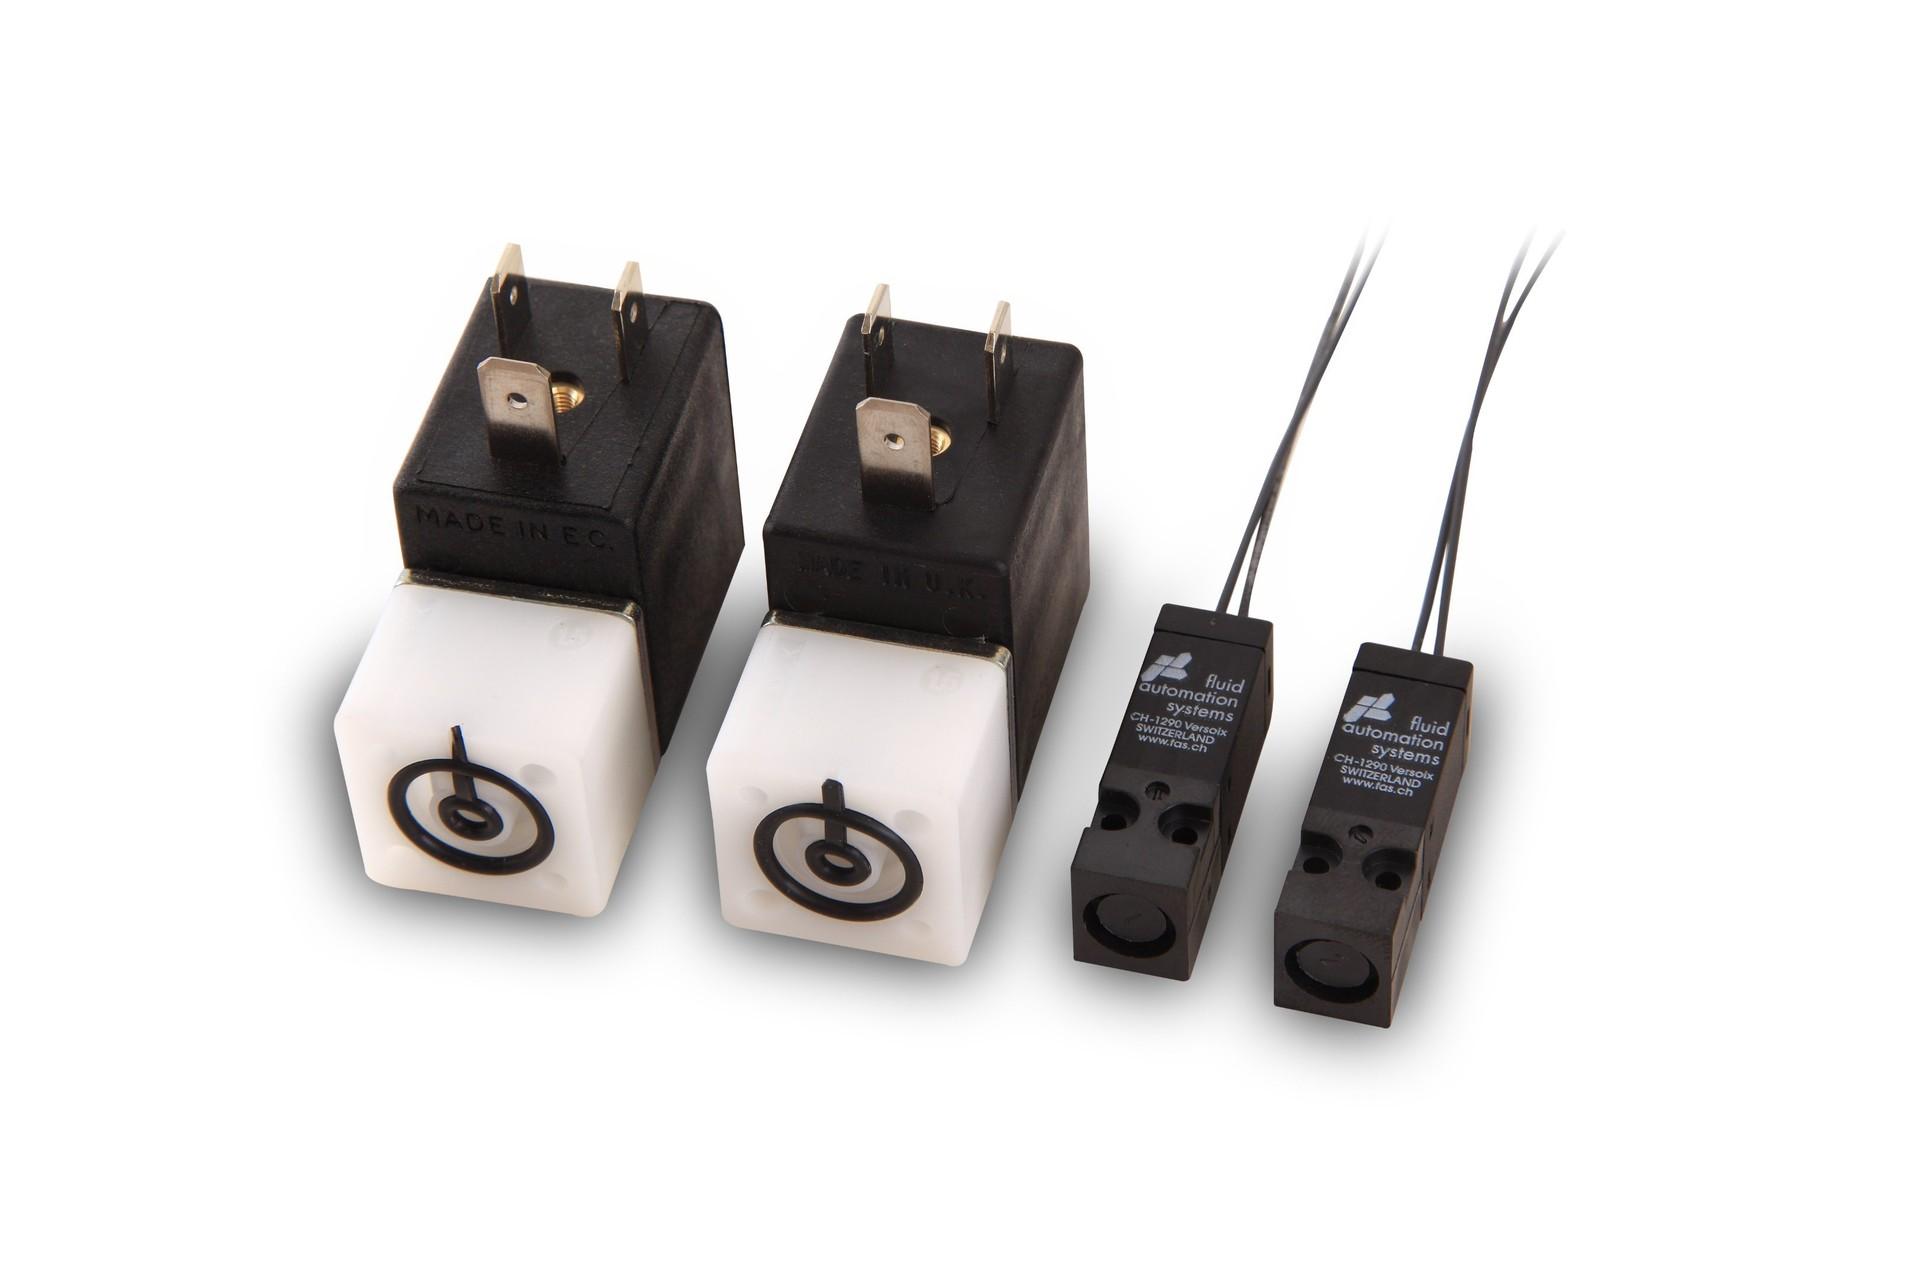 Lead Tech Lt1000s+ PP Pipe Coding Cij Inkjet Printer